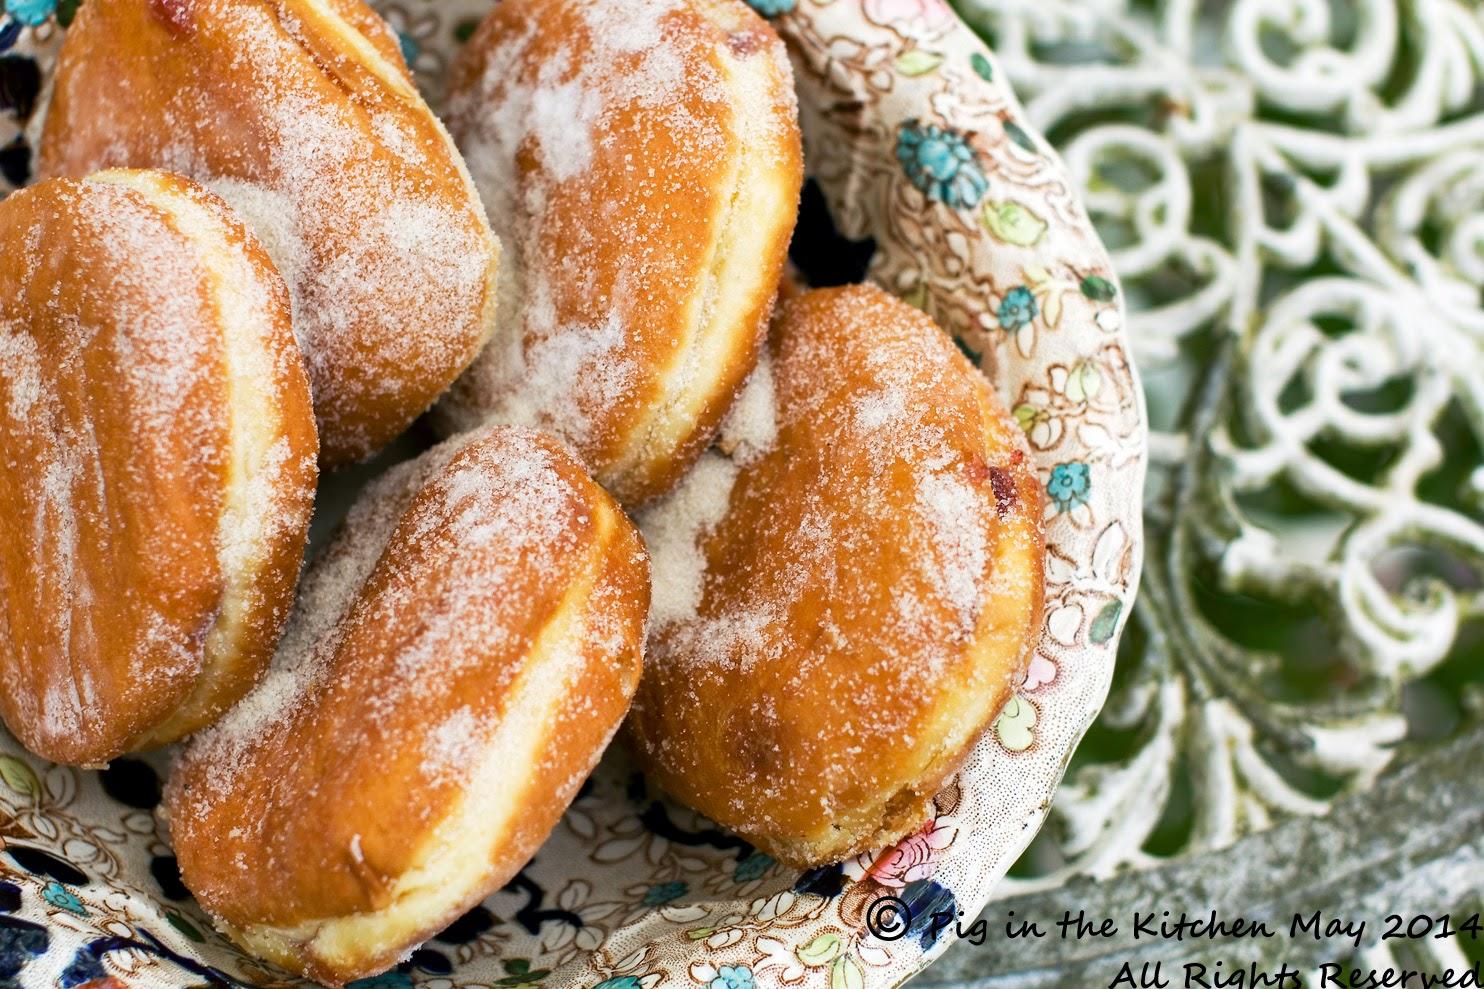 doughnuts piginthekitchen